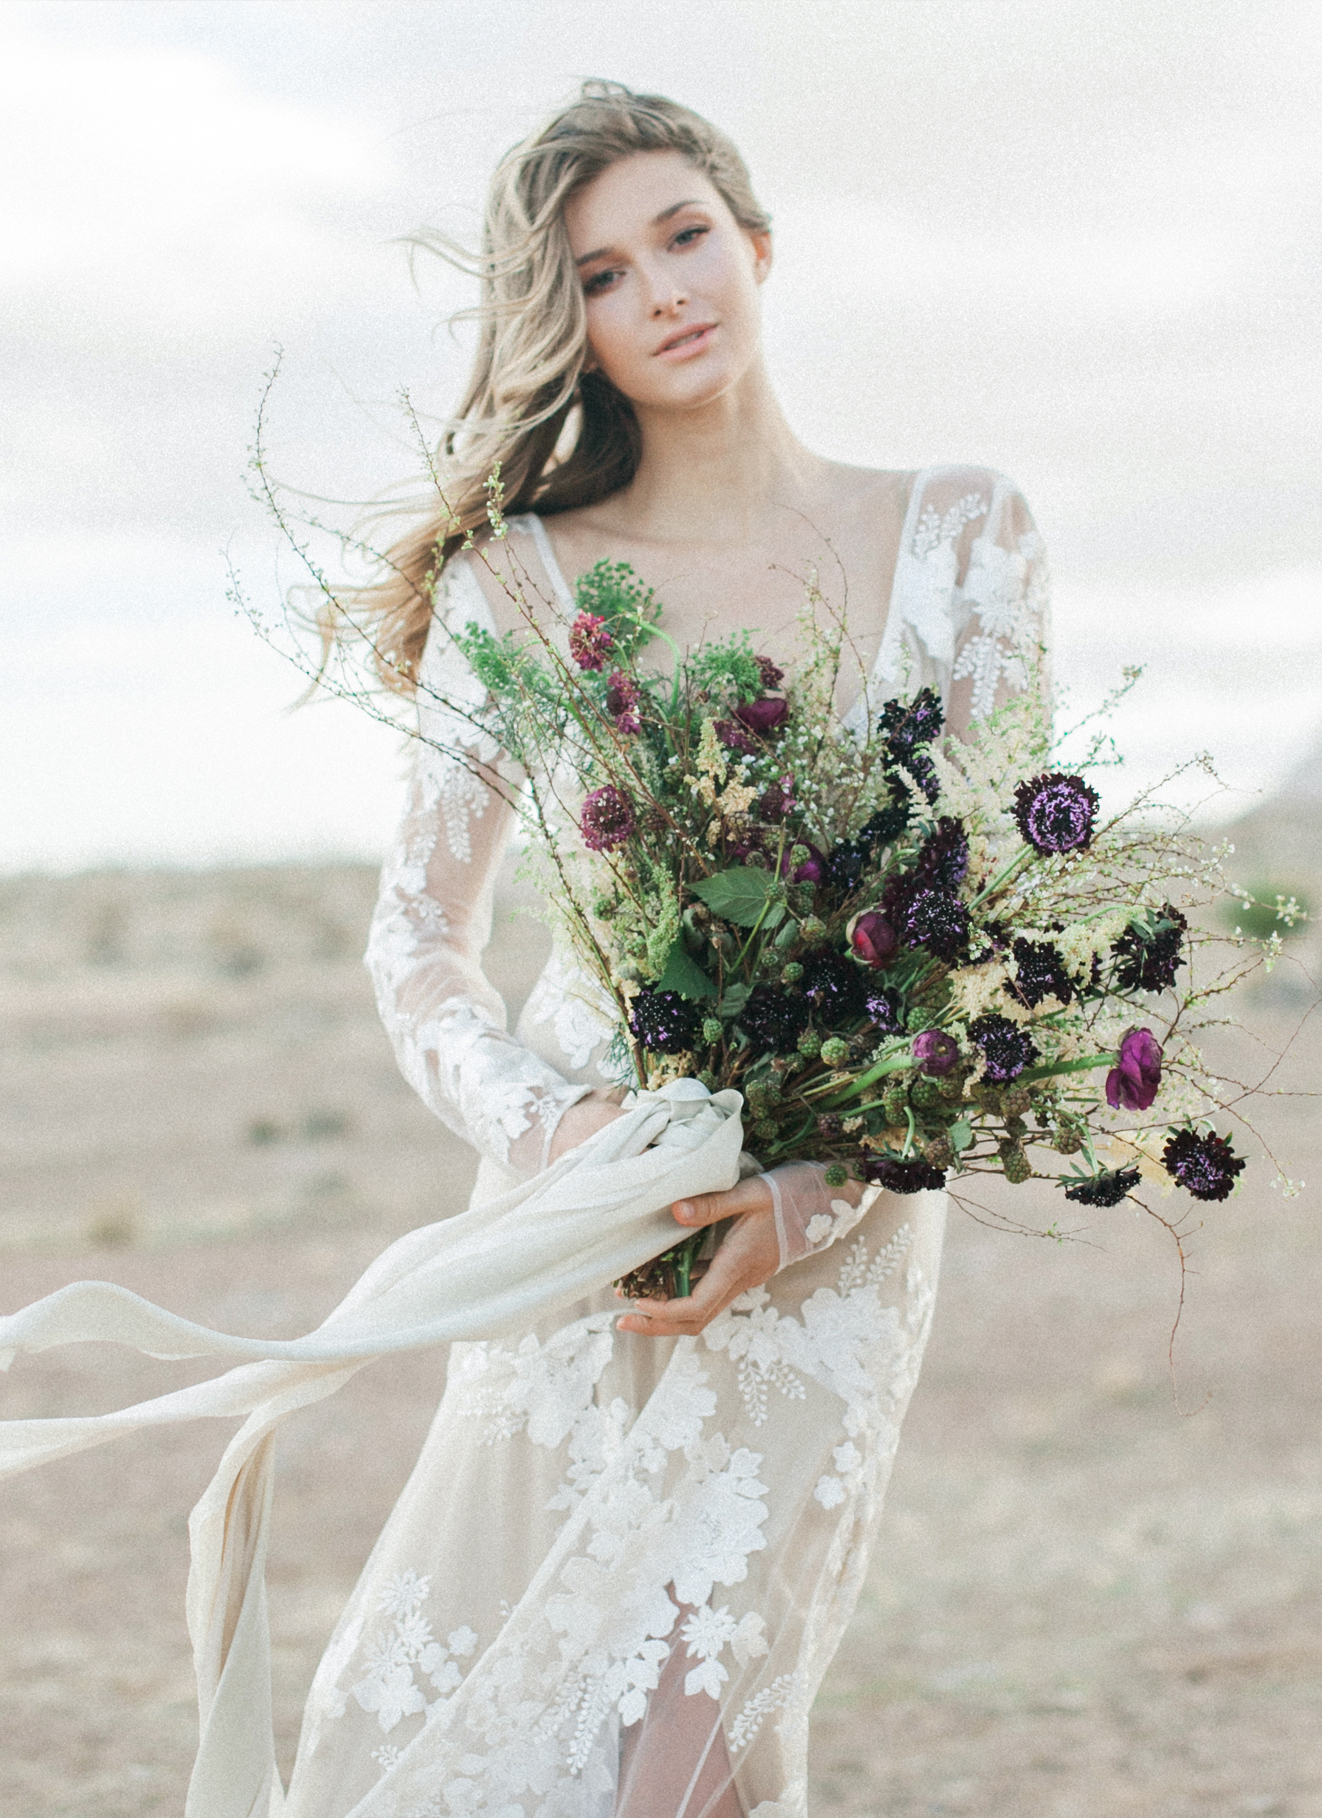 The Wild Rose -